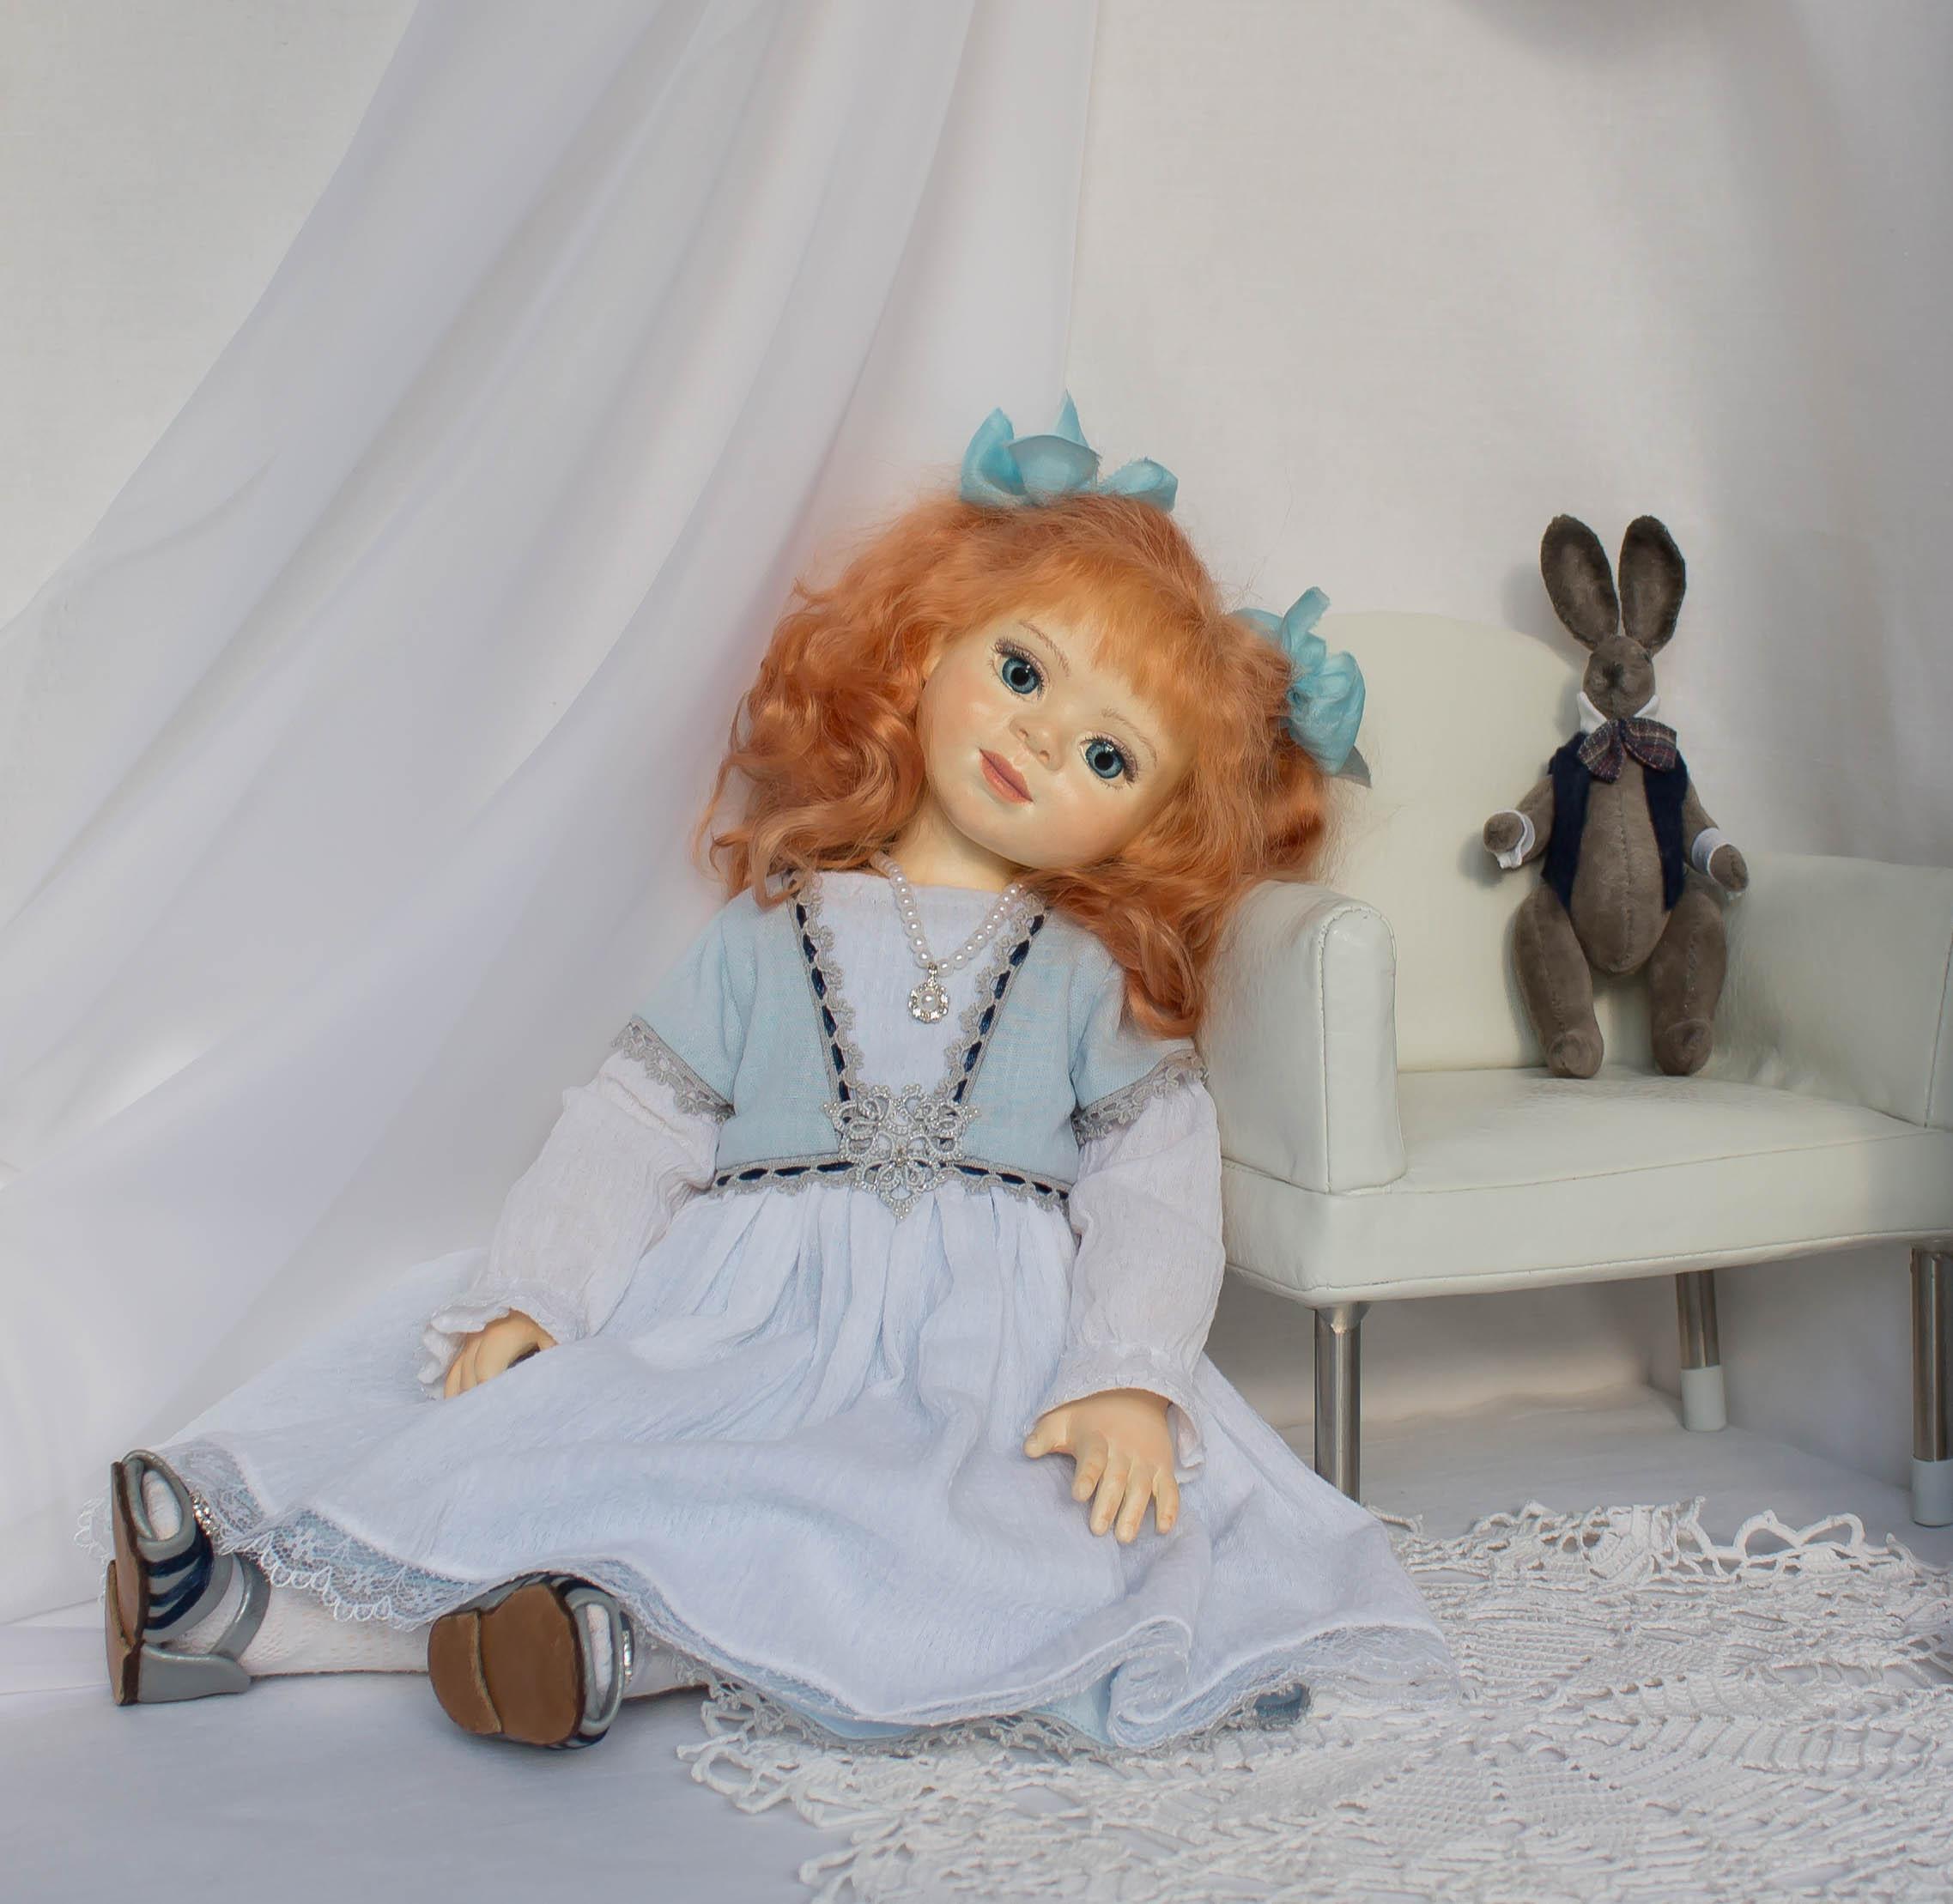 Алиса. Авторская ручная работа